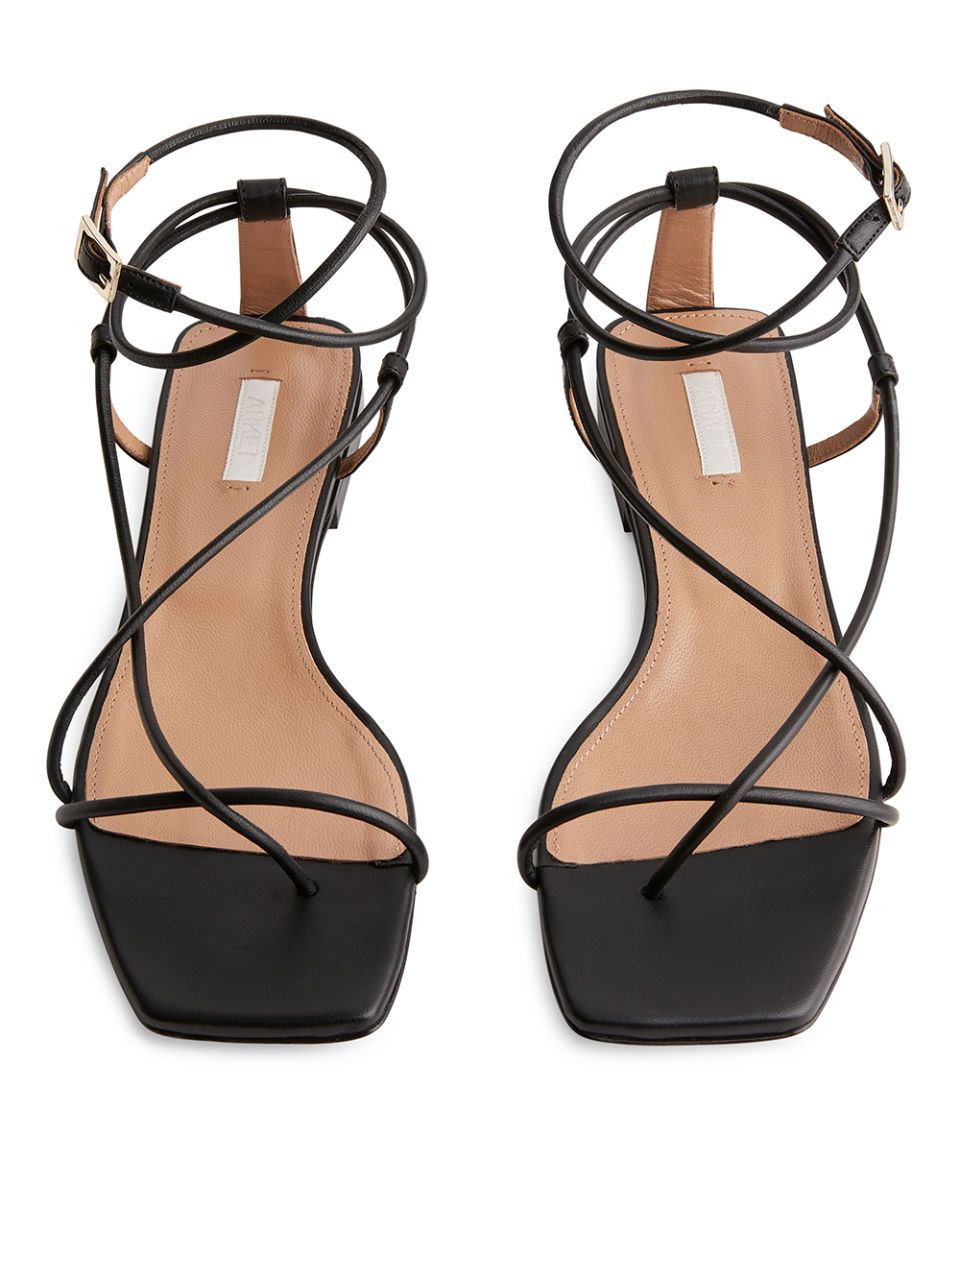 Side Image Of Arket Flat Leather Strap Sandal In Black Leather Strap Sandals Minimalist Shoes Sandals Heels